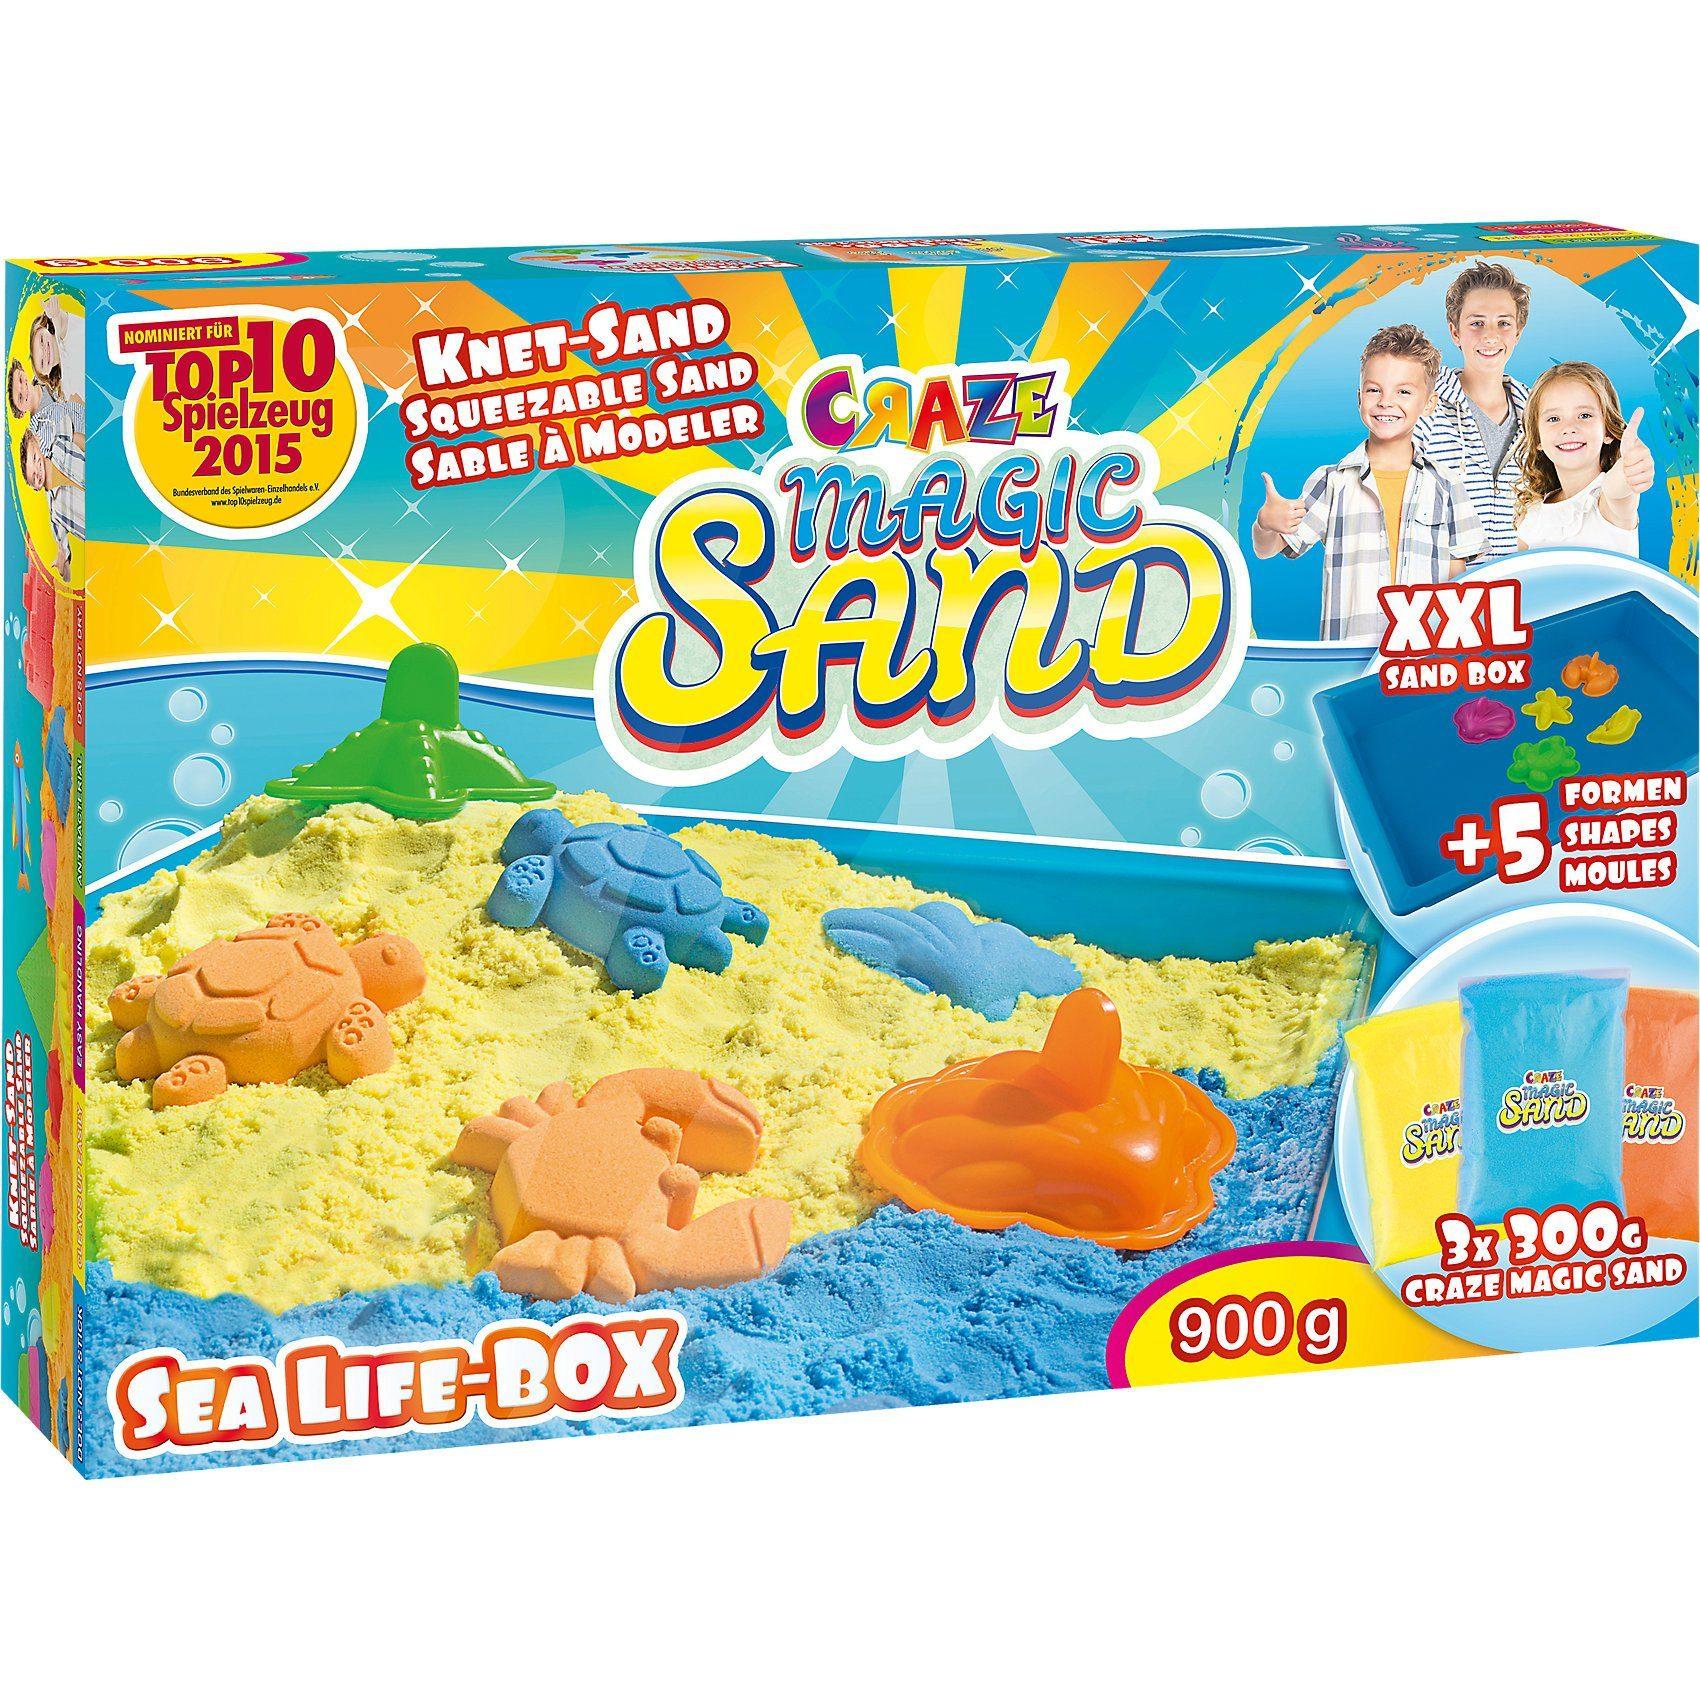 CRAZE Magic Sand - Sea Life Box